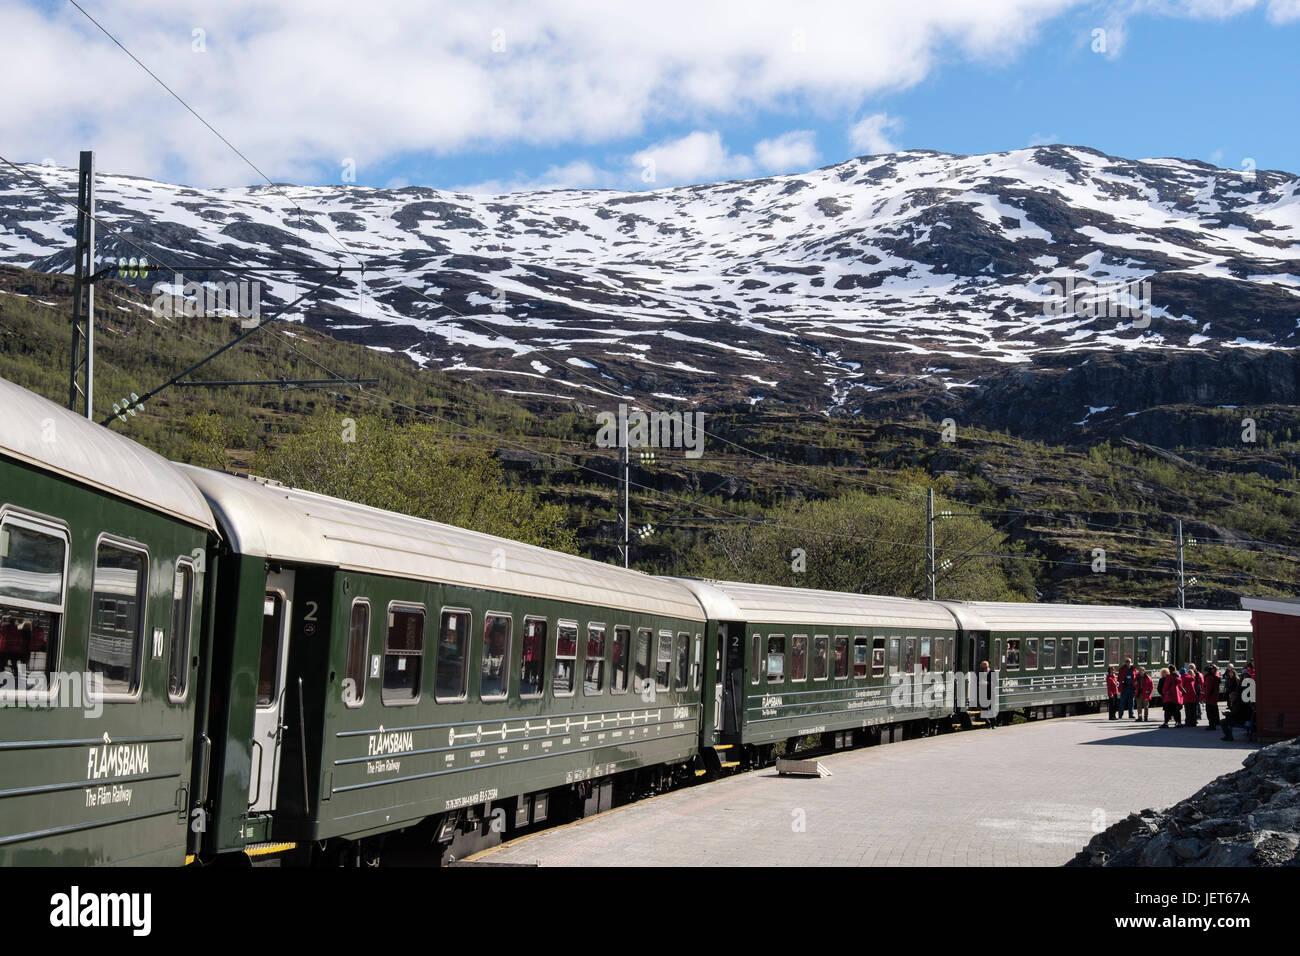 Flam Railway train in the station with passengers on platform. Vatnahelsen, Aurland, Norway, Scandinavia, Europe - Stock Image